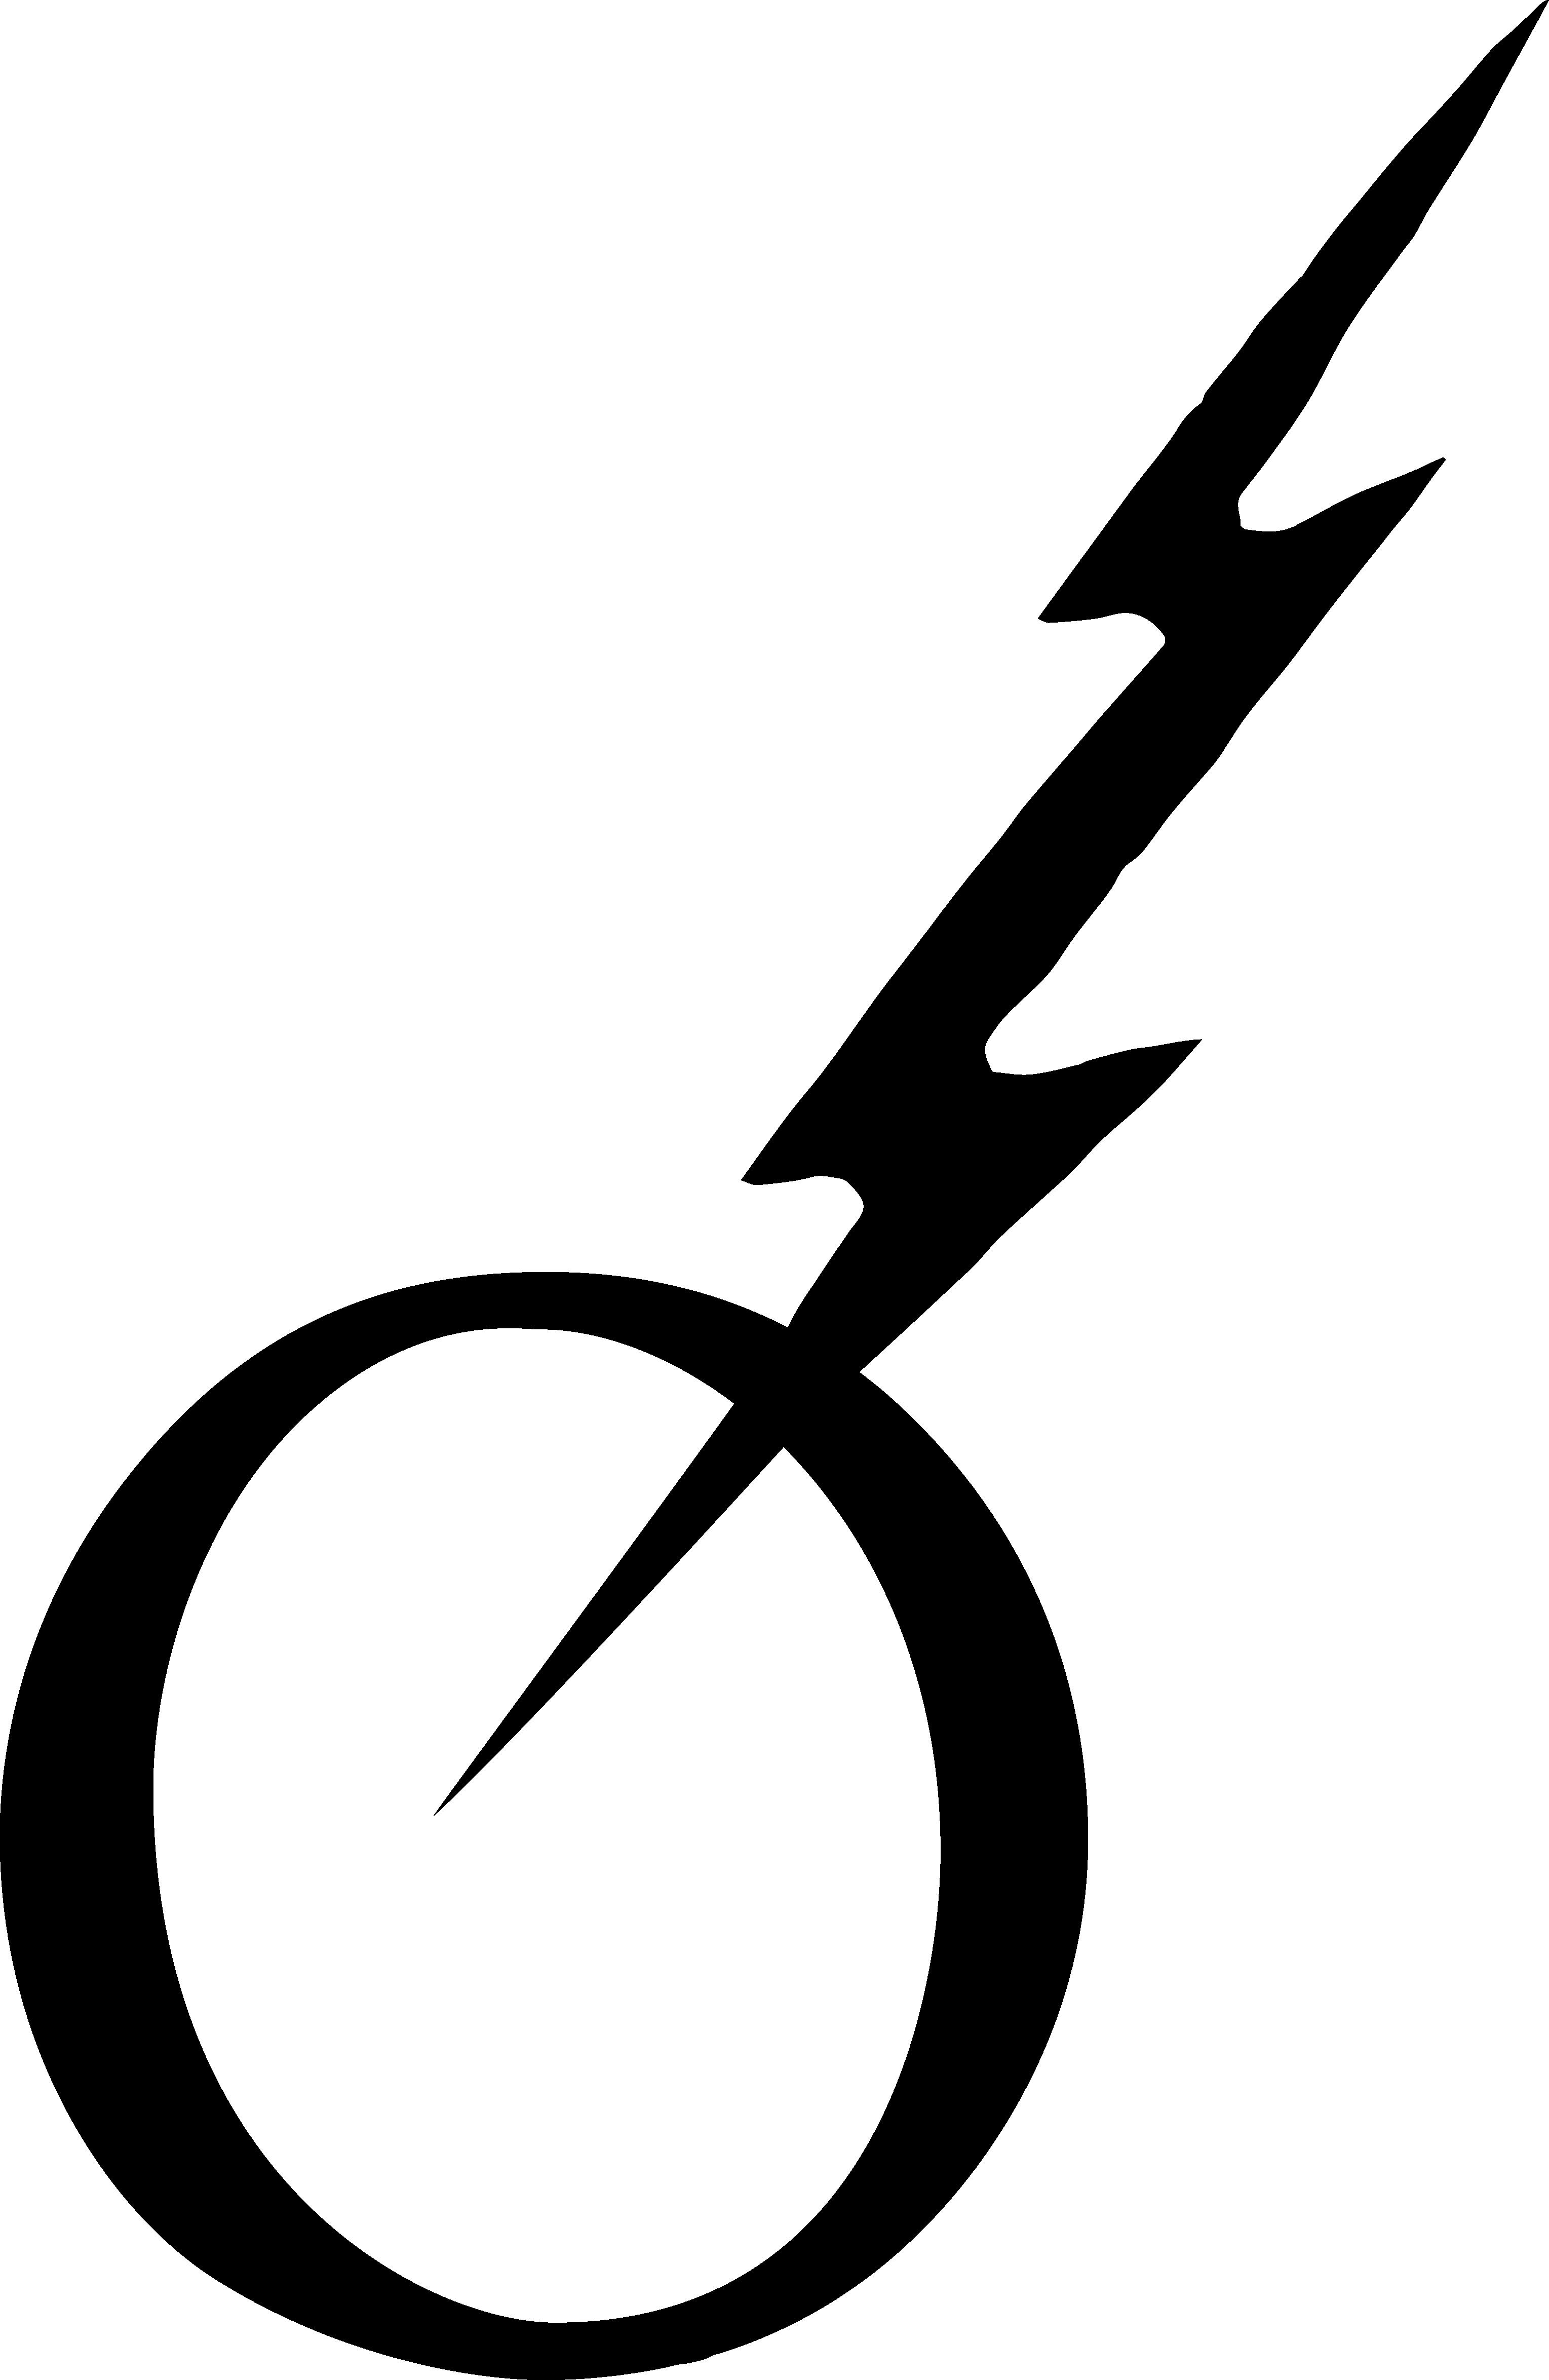 Herosignal